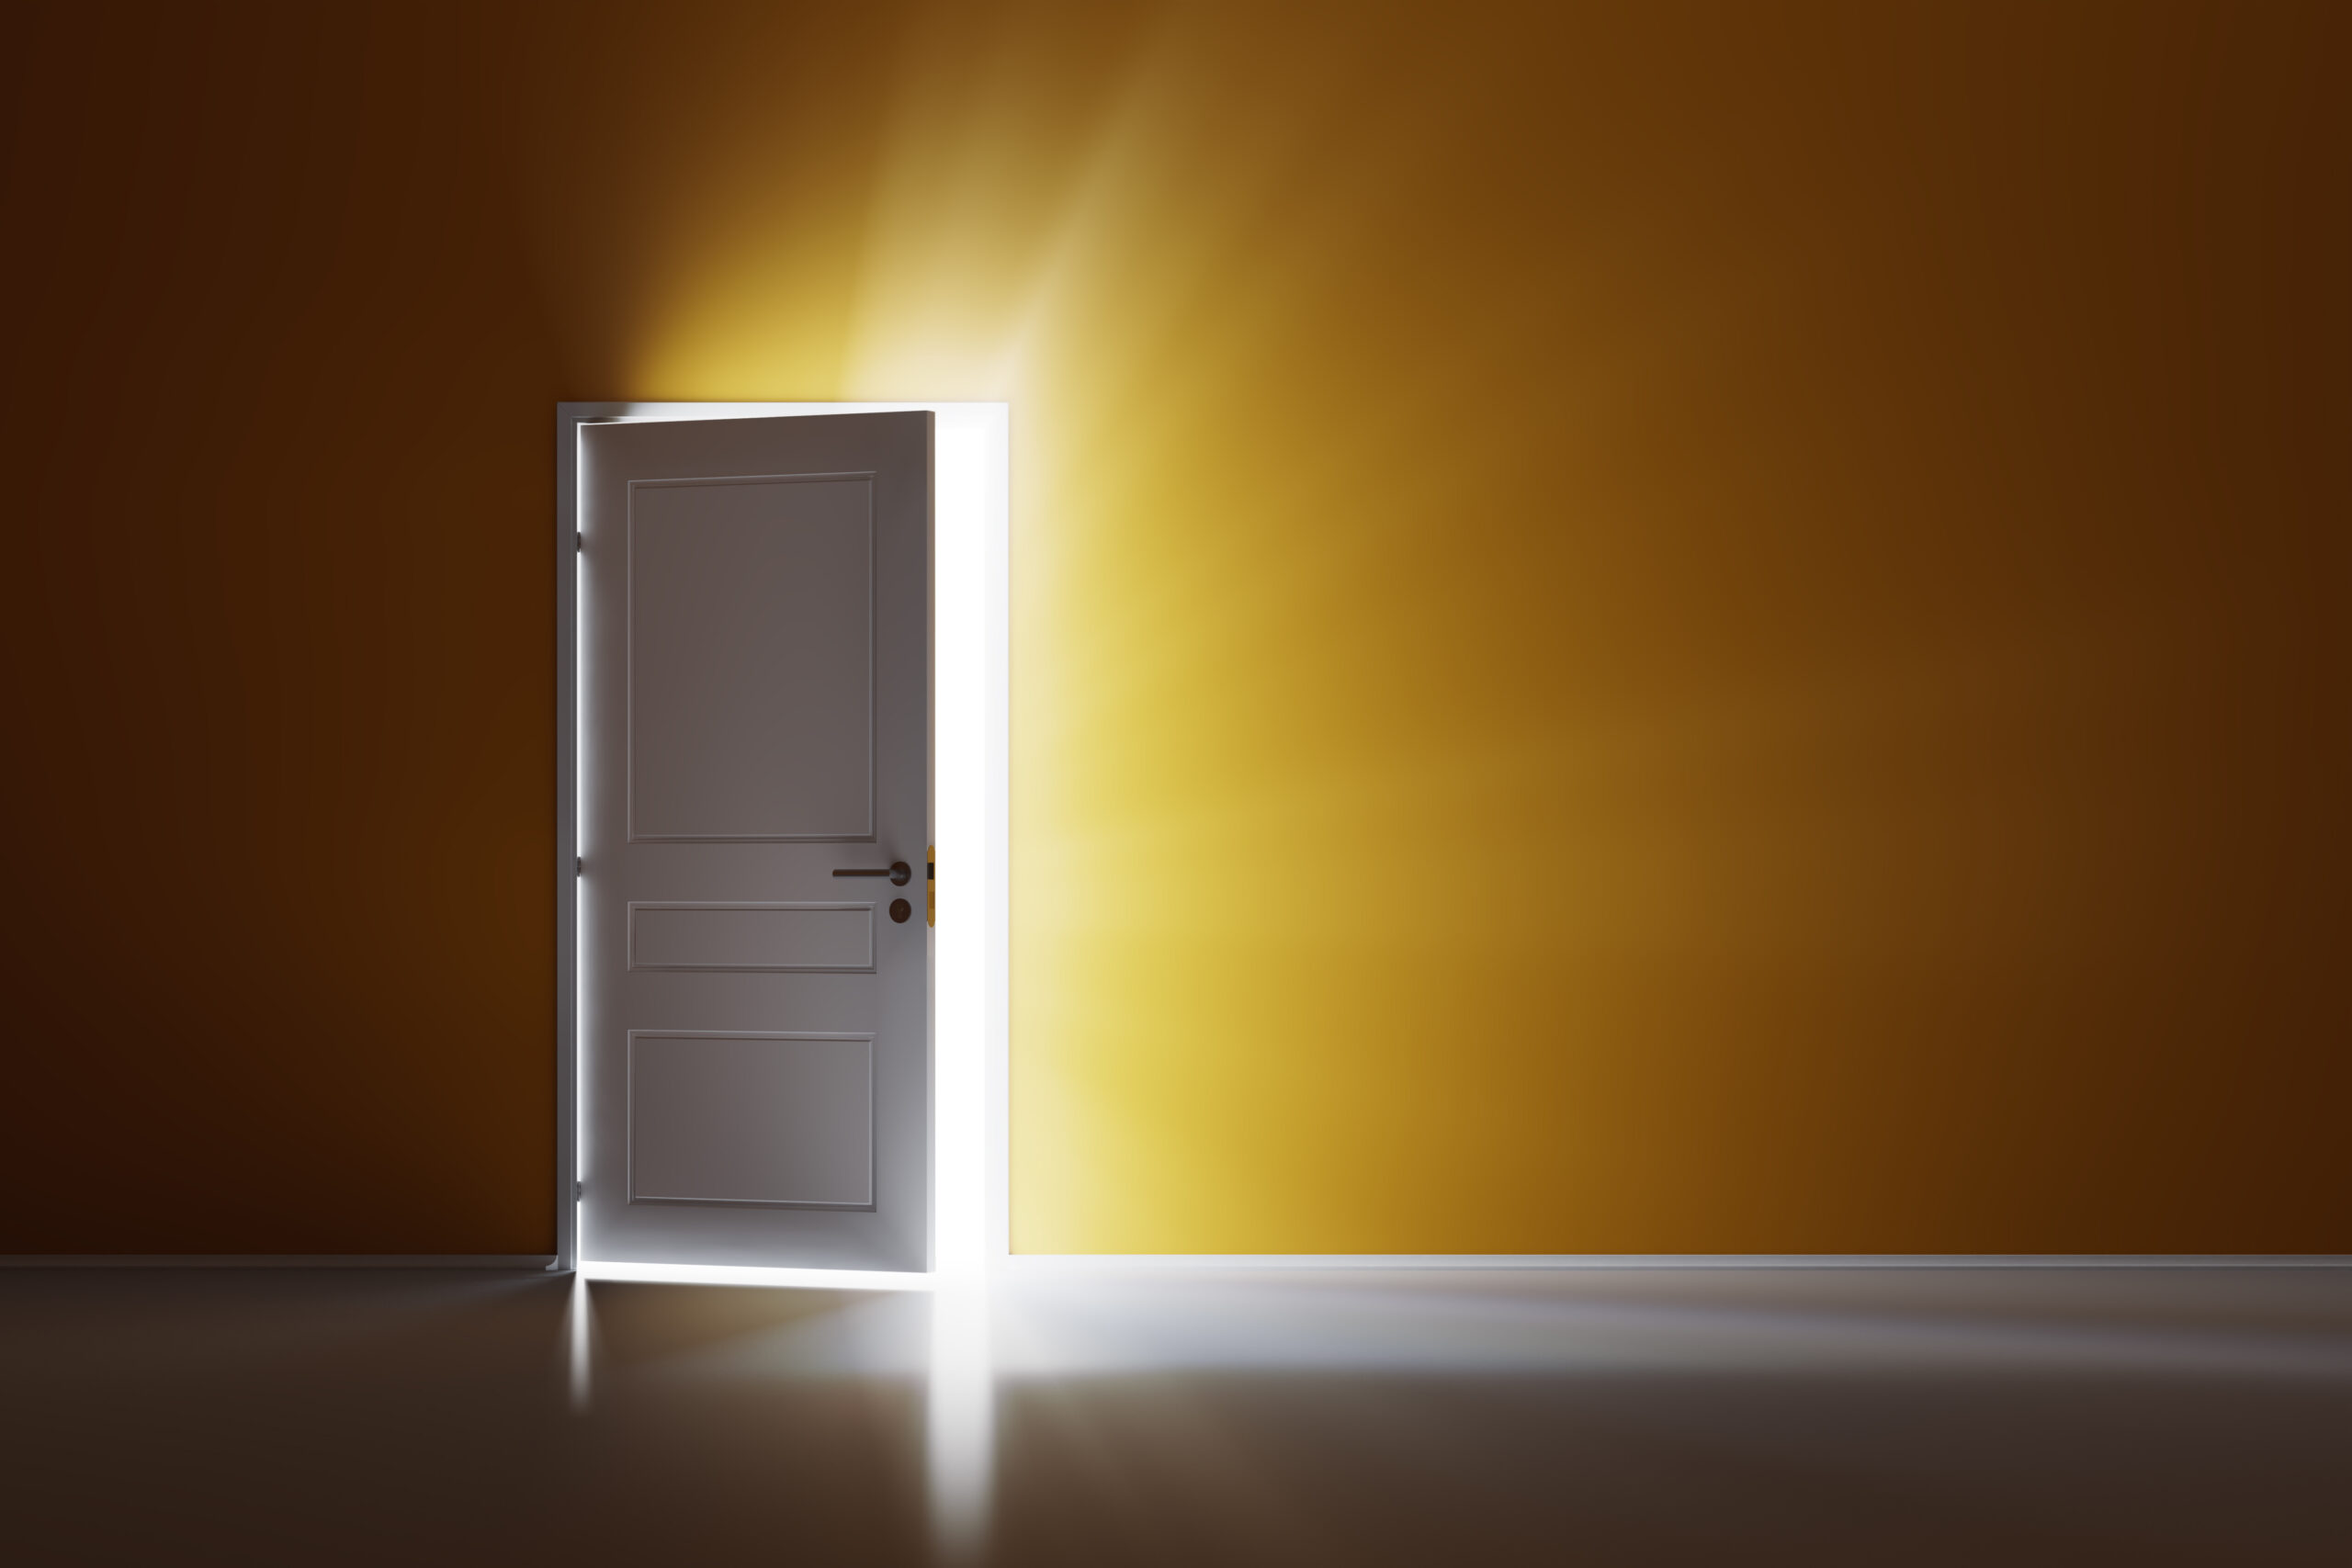 Rays of light through the open white door on orange wall